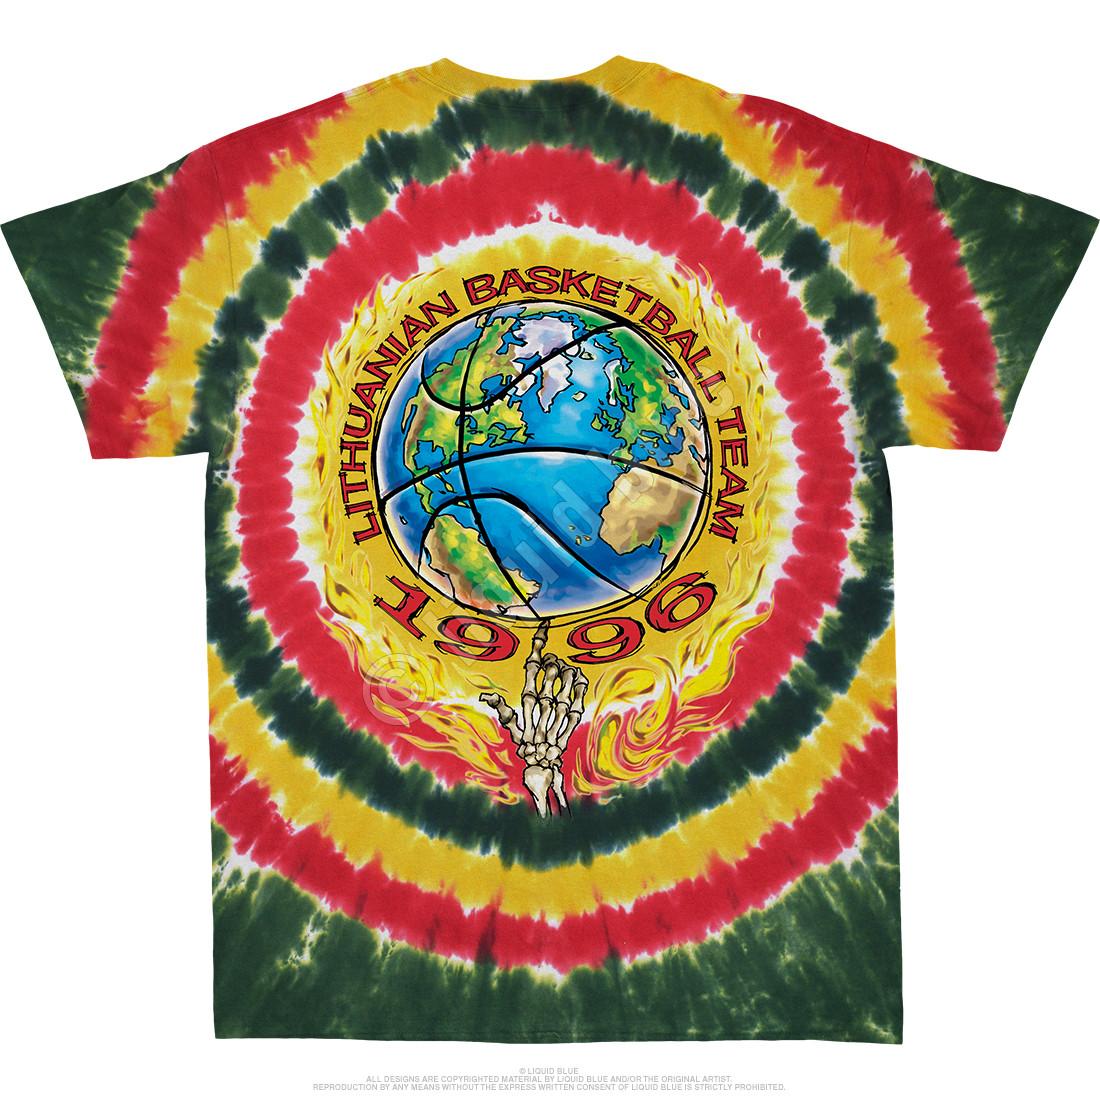 Lithuania Slammin Tie-Dye T-Shirt